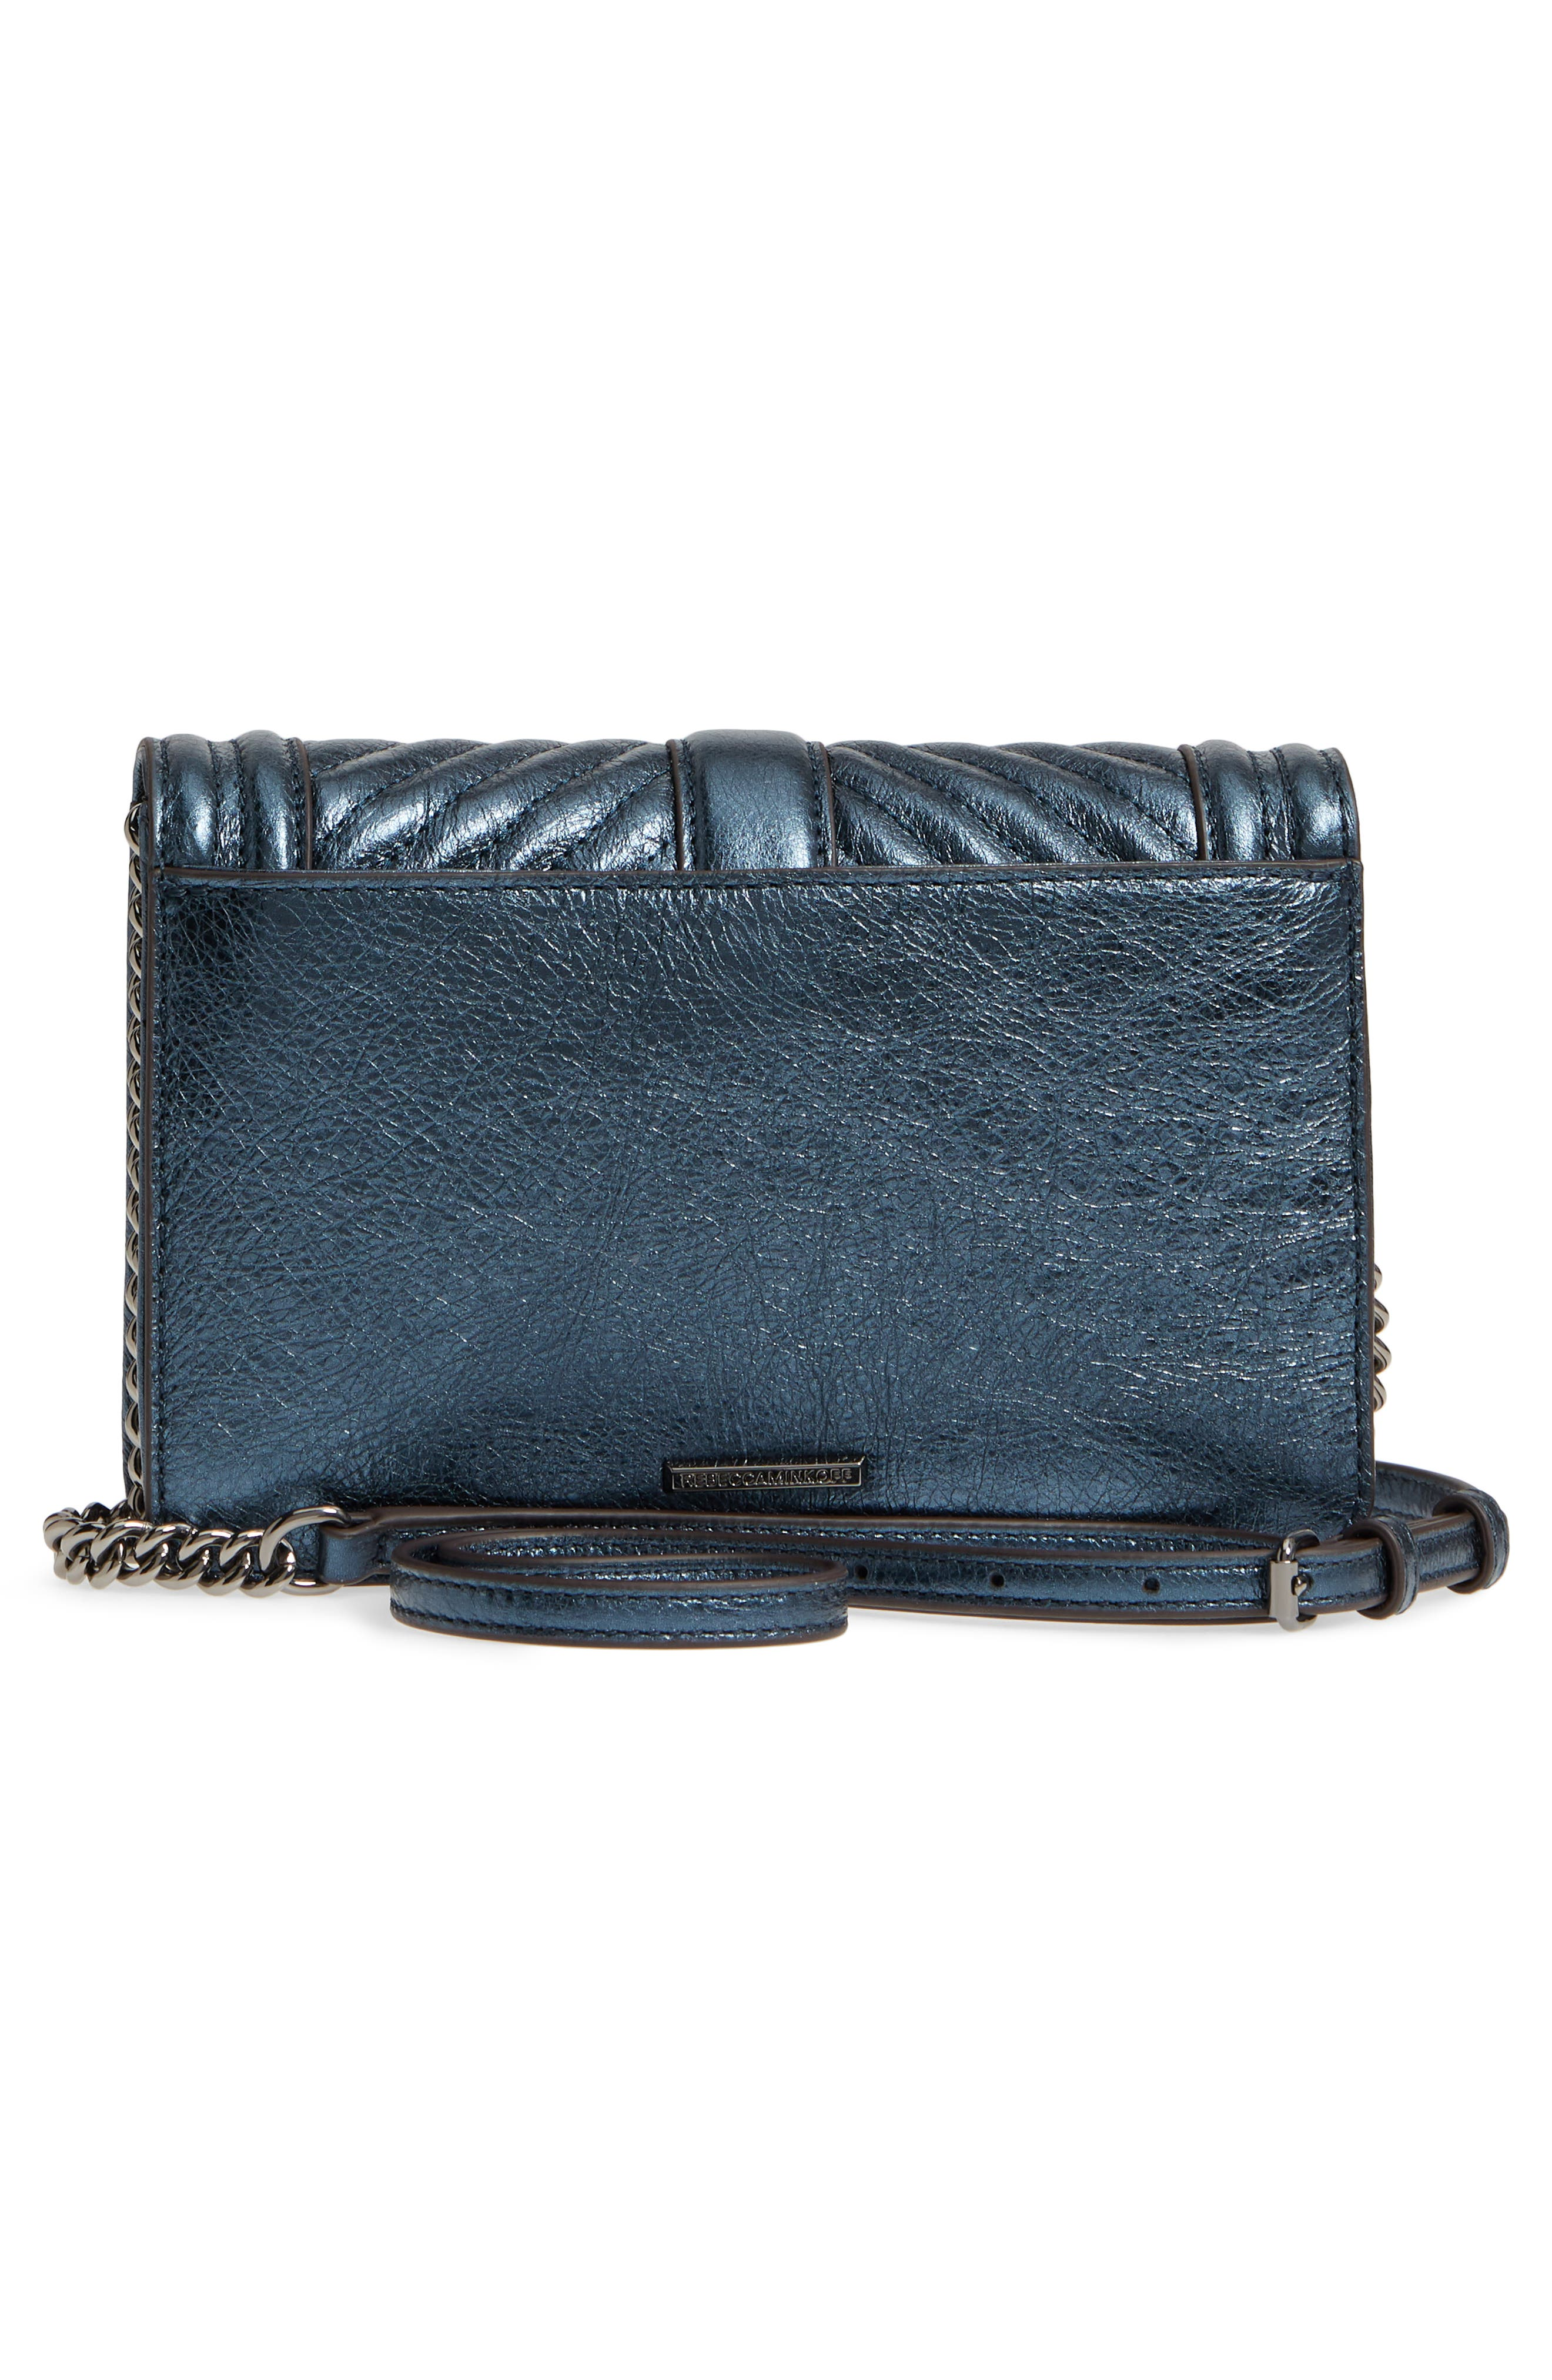 Small Love Metallic Leather Crossbody Bag,                             Alternate thumbnail 8, color,